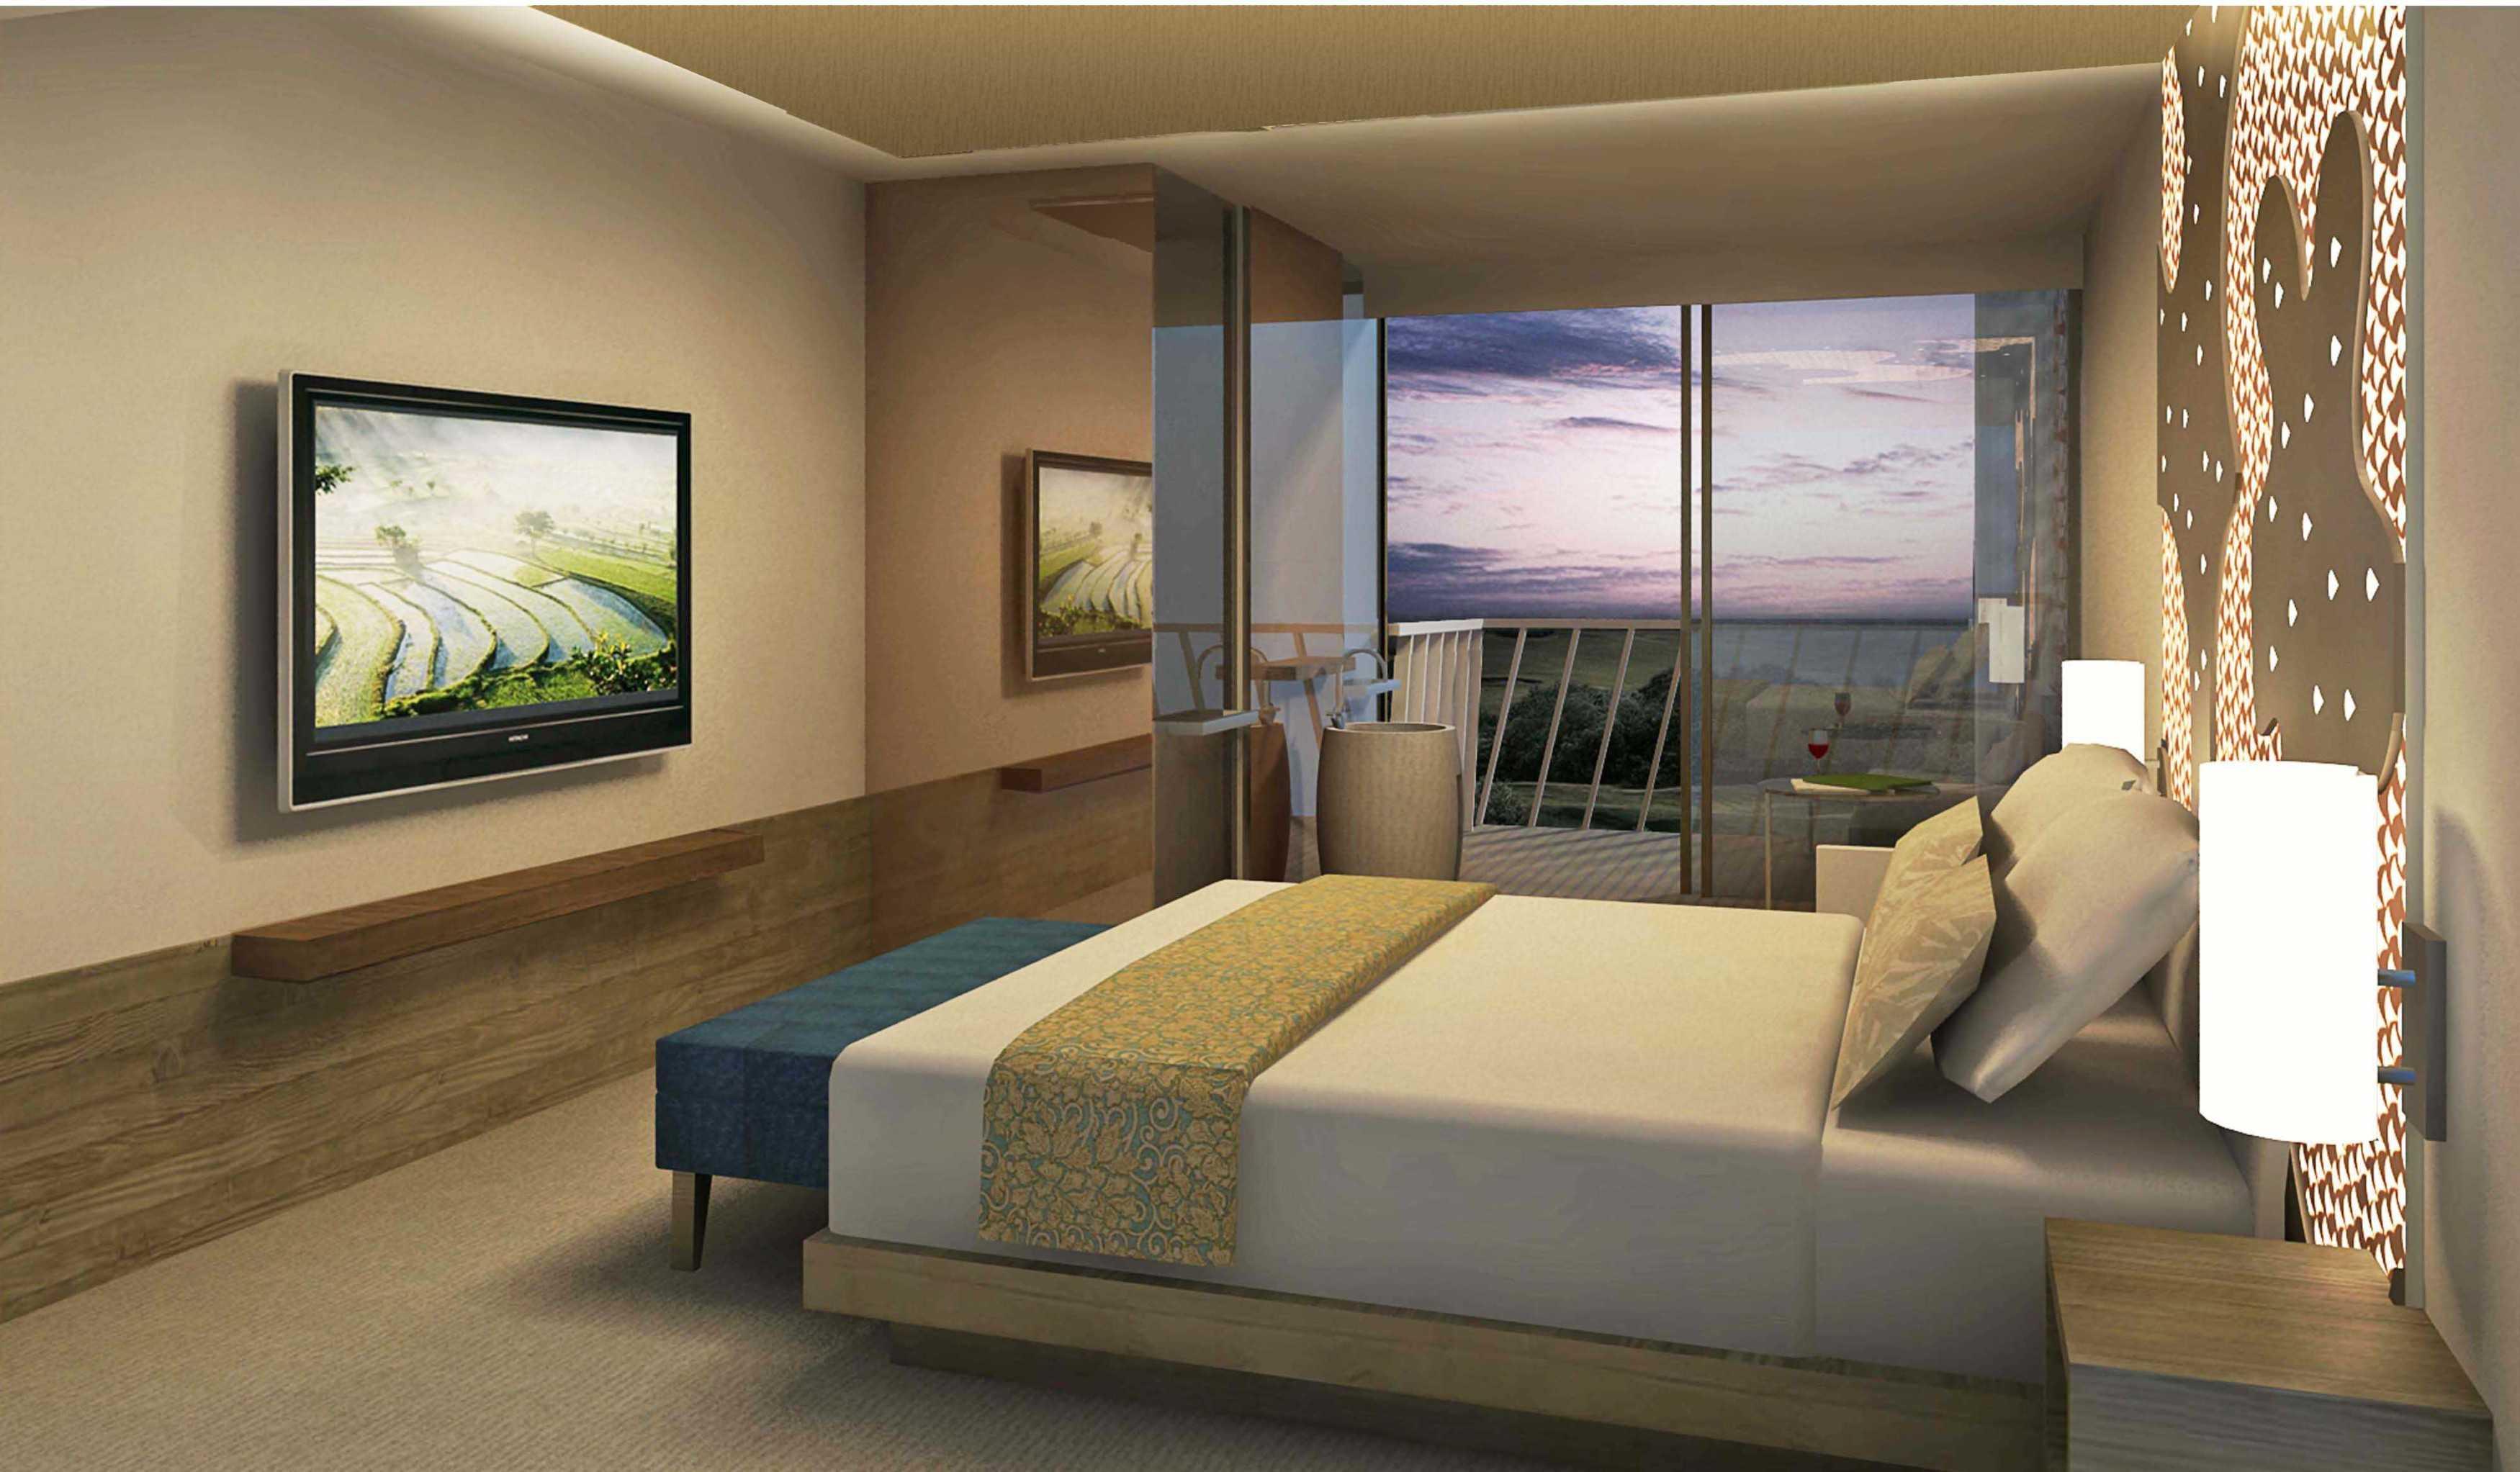 Mikael Wahyu Villa Pecatu Bali Bali Unit-Hotel-Room-Perspective-1   26065